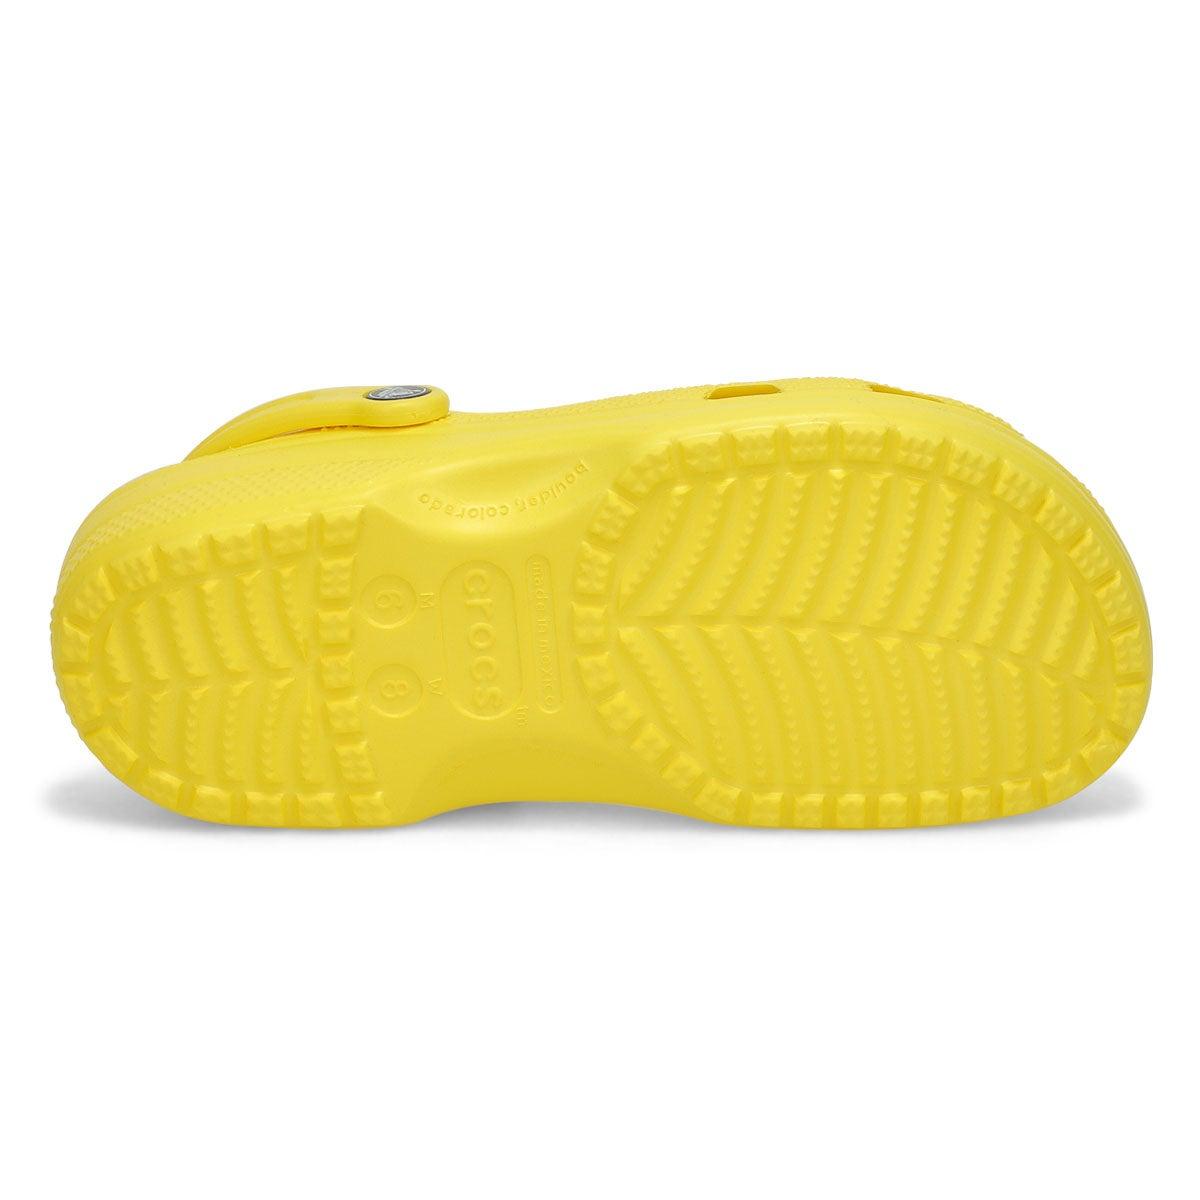 Lds Classic lemon EVA comfort clog